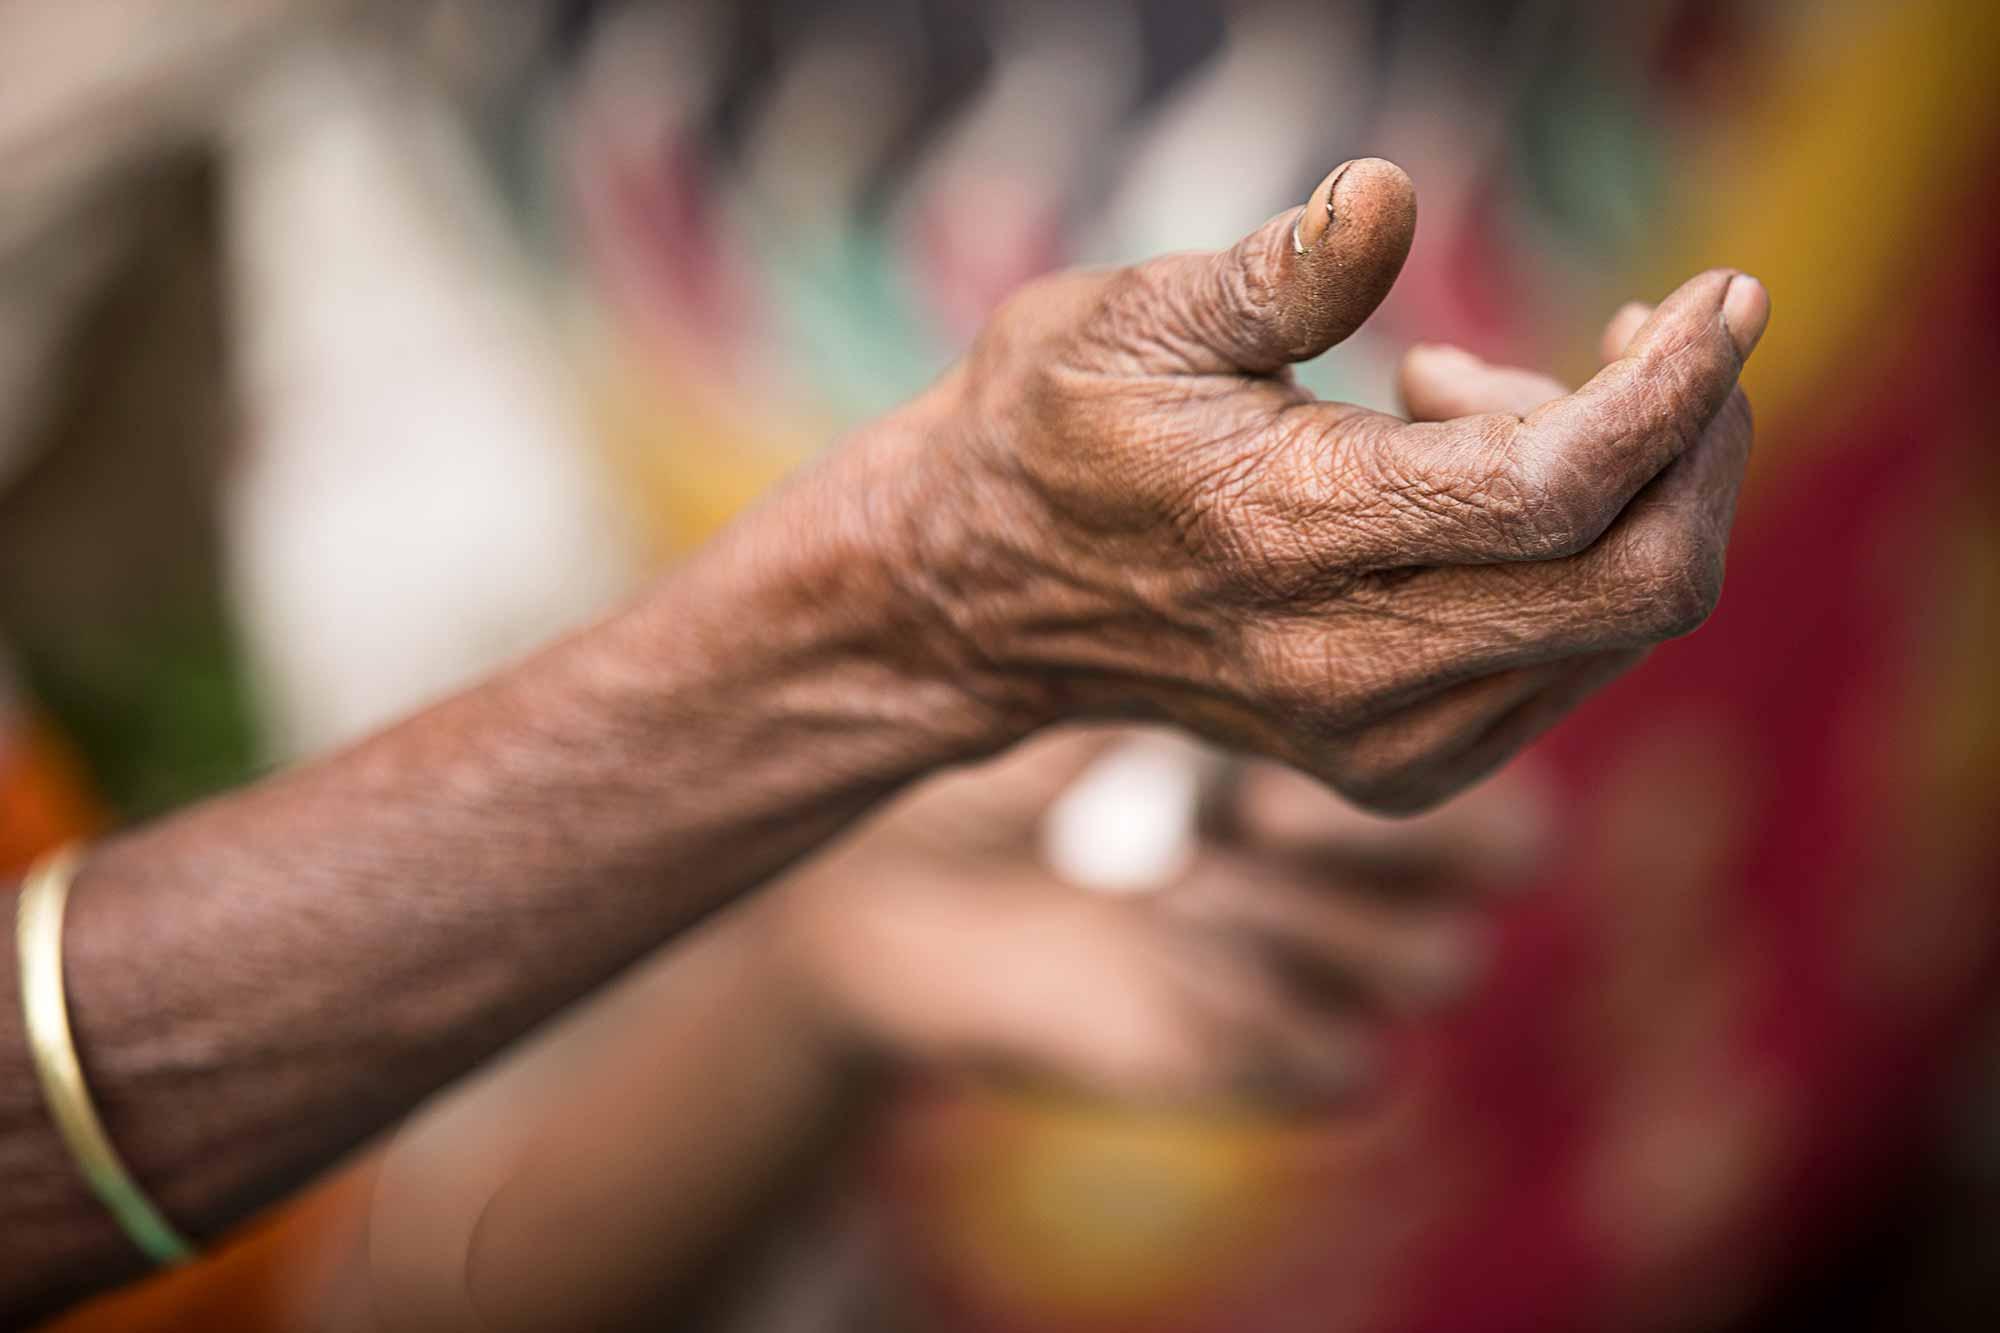 hand-woman-wrinkles-kolkata-india